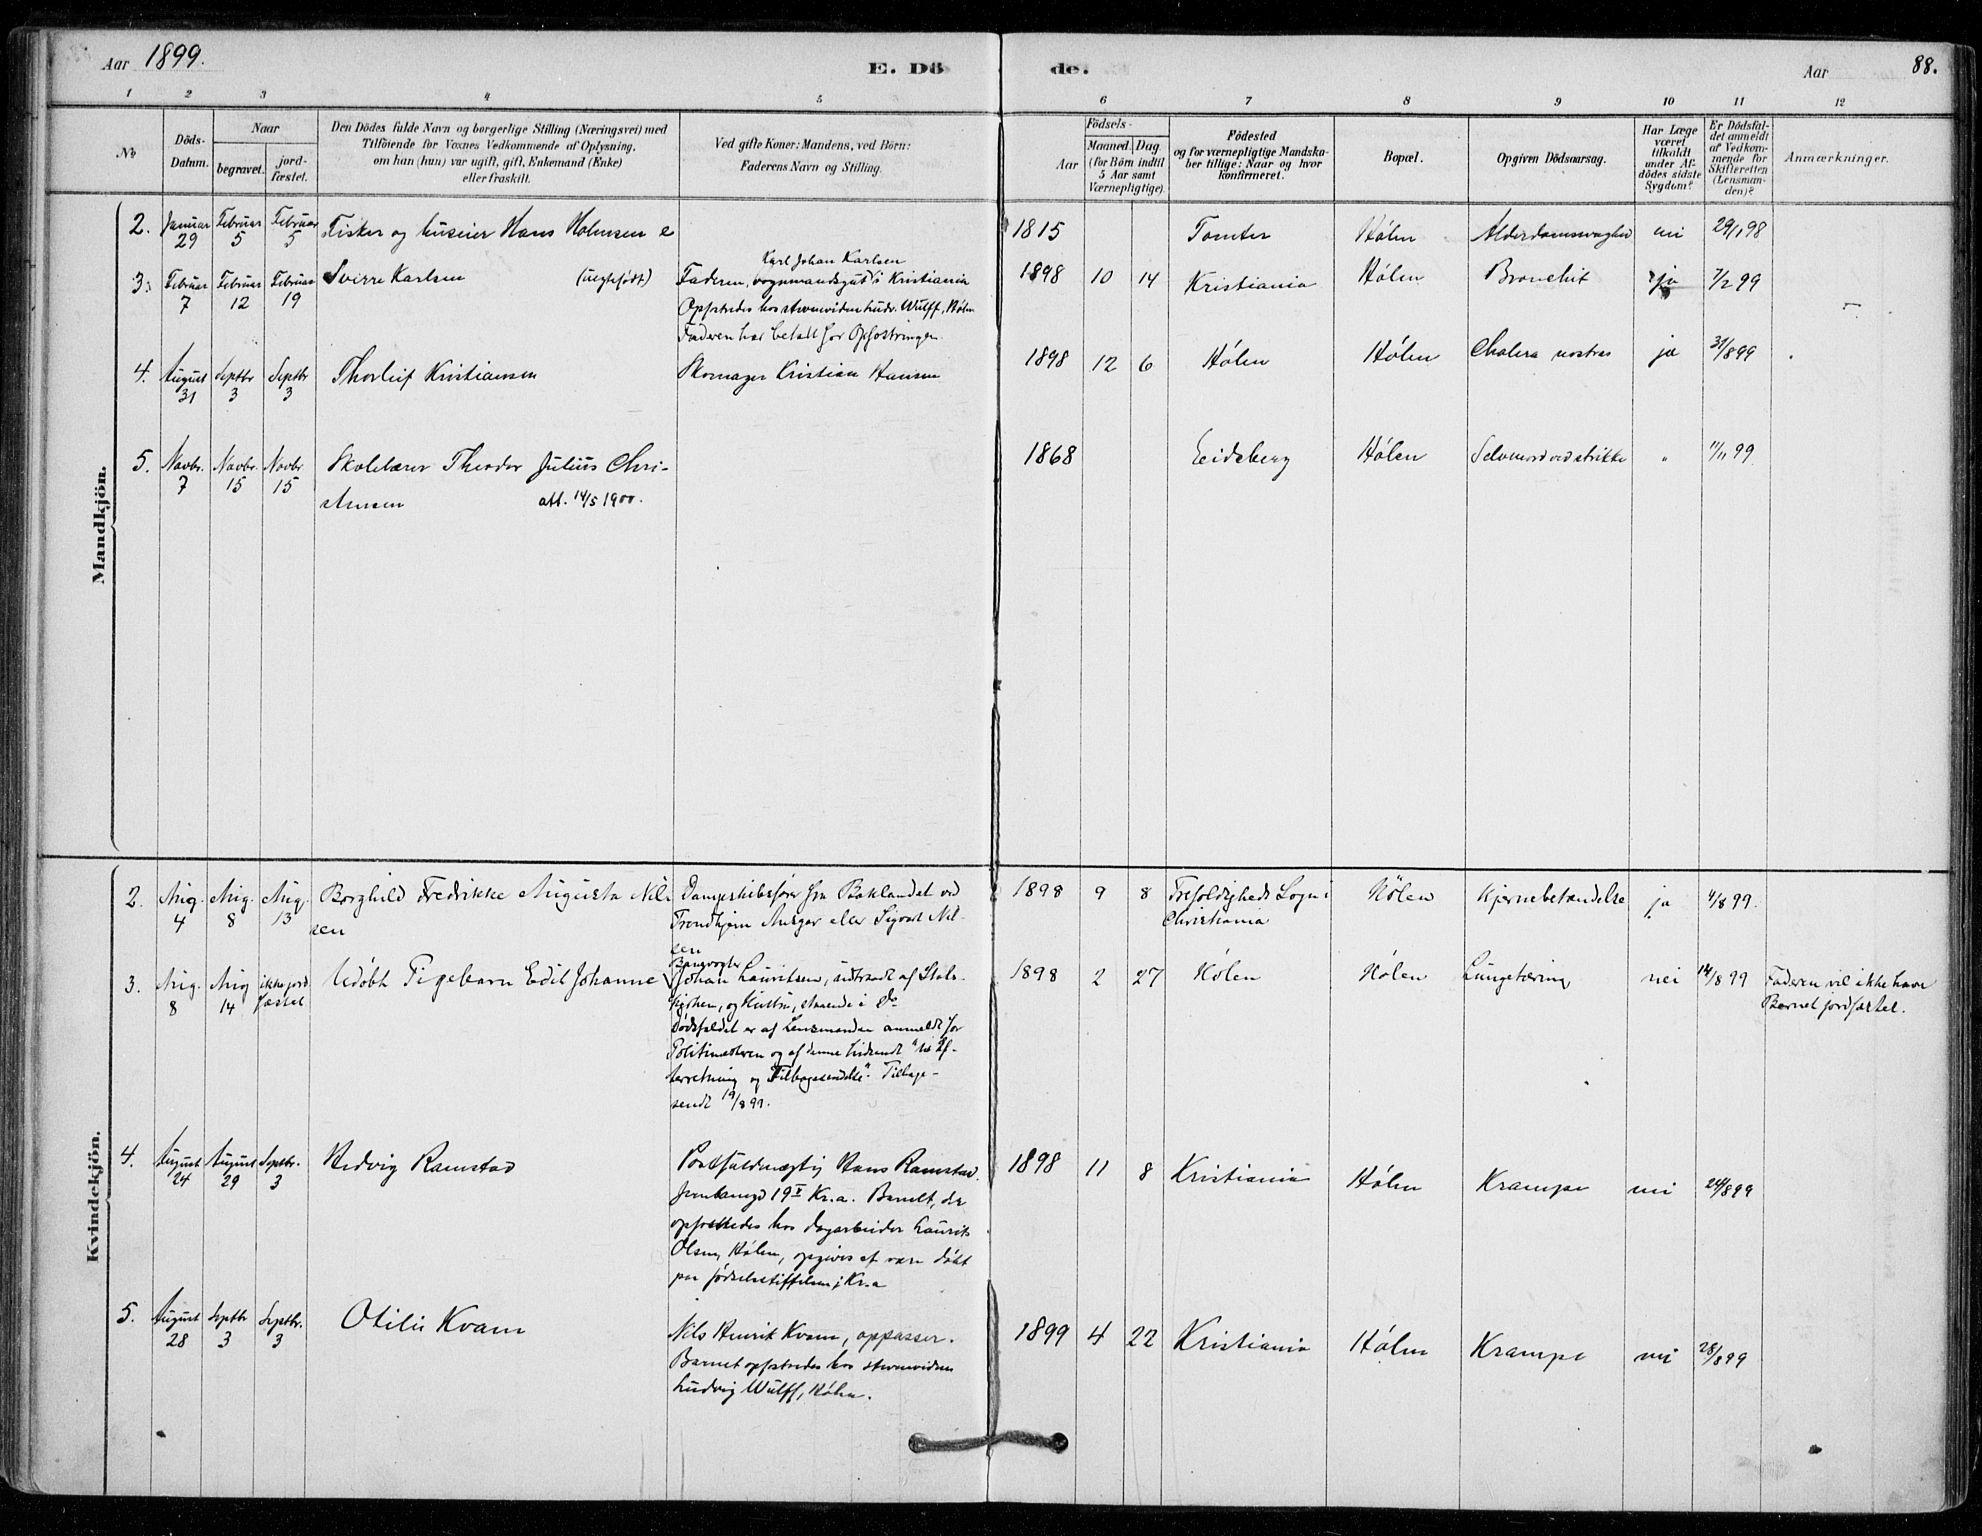 SAO, Vestby prestekontor Kirkebøker, F/Fe/L0001: Ministerialbok nr. V 1, 1878-1931, s. 88